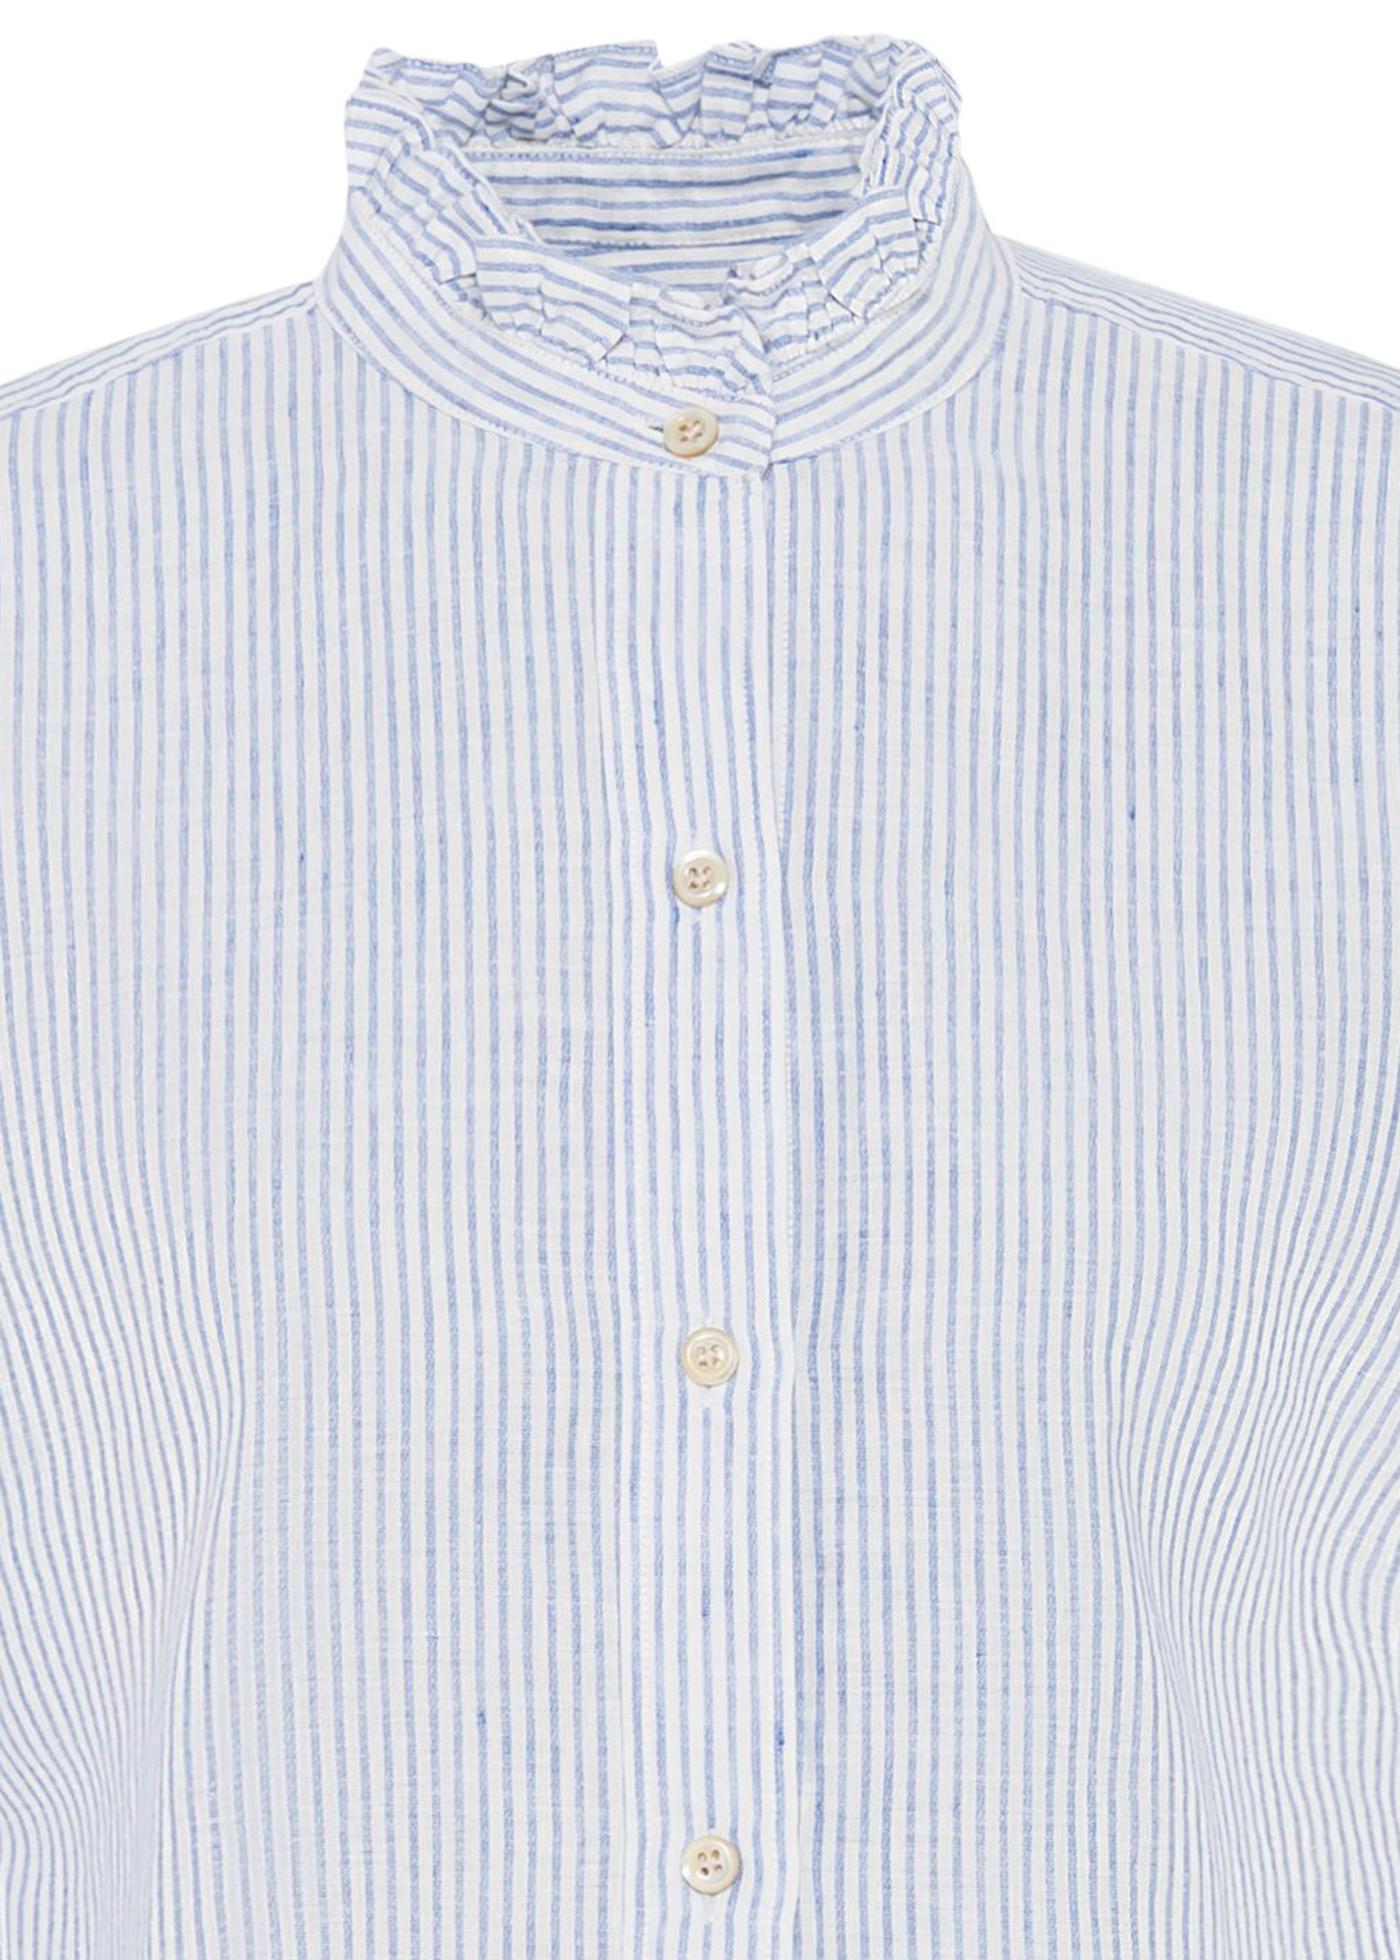 Shirt SAOLI image number 2